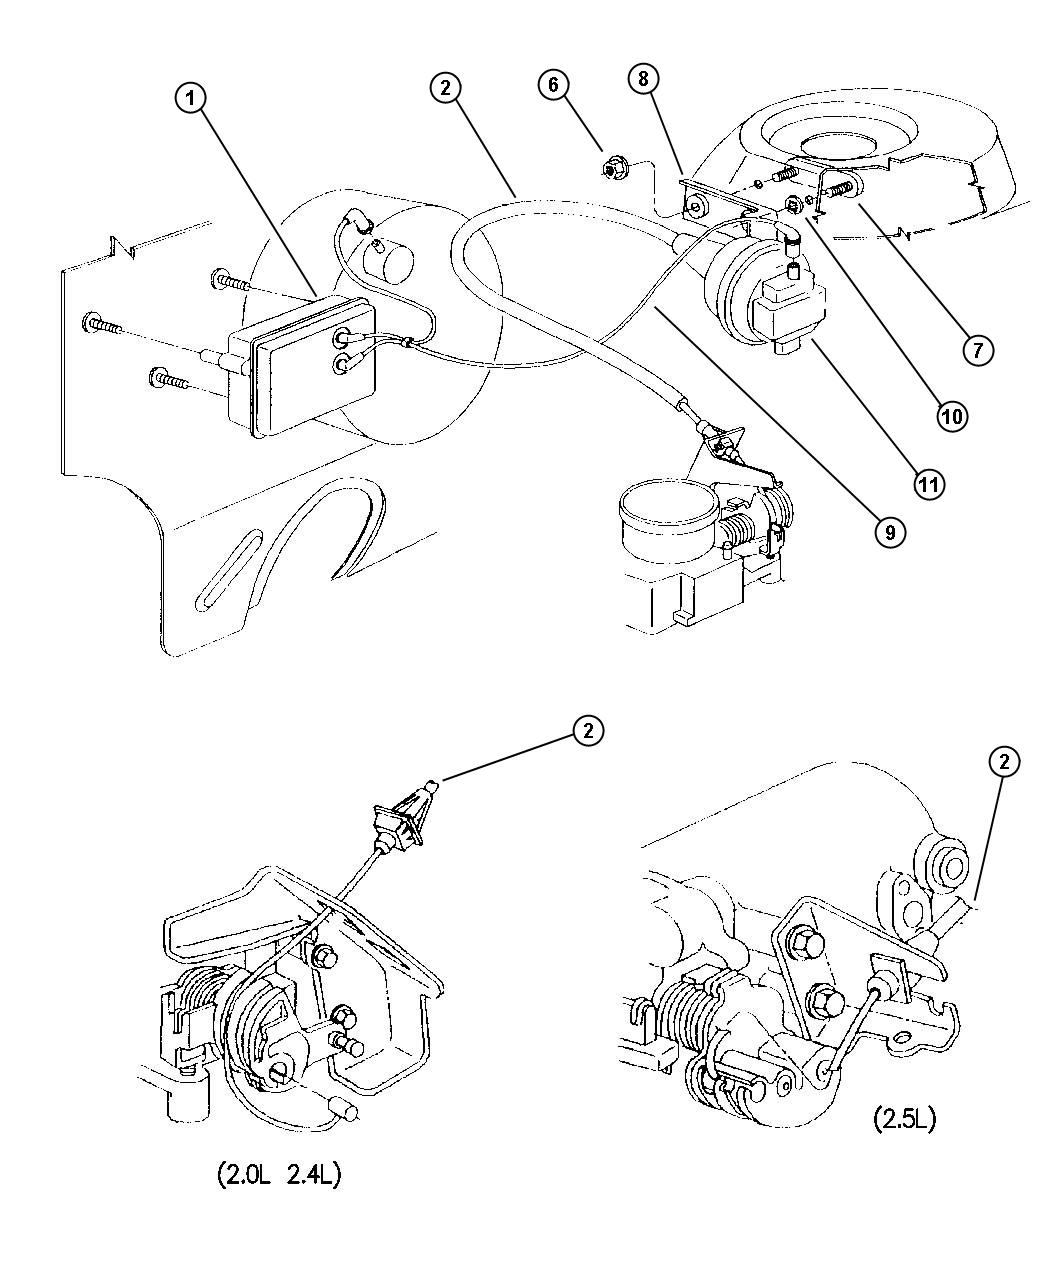 hight resolution of 1998 dodge 2 5l engine diagram stratus dodge auto wiring